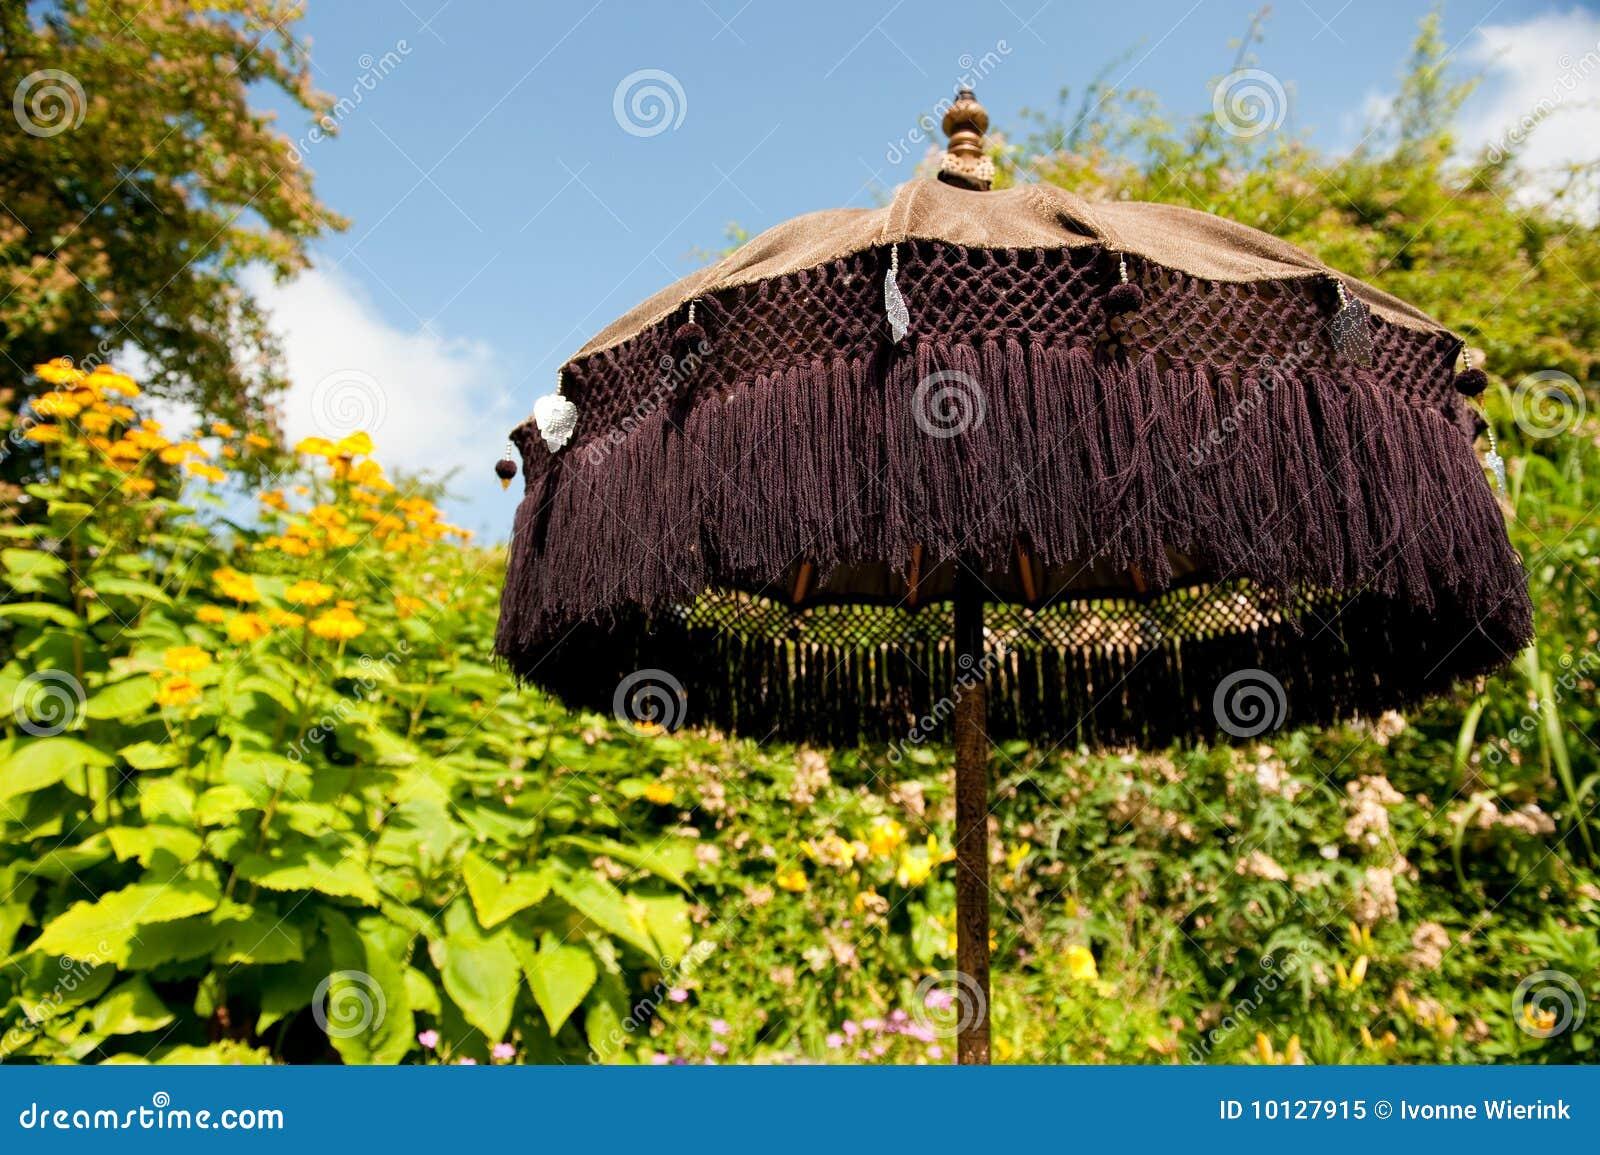 orientalischer sonnenschirm lizenzfreies stockfoto bild 10127915. Black Bedroom Furniture Sets. Home Design Ideas